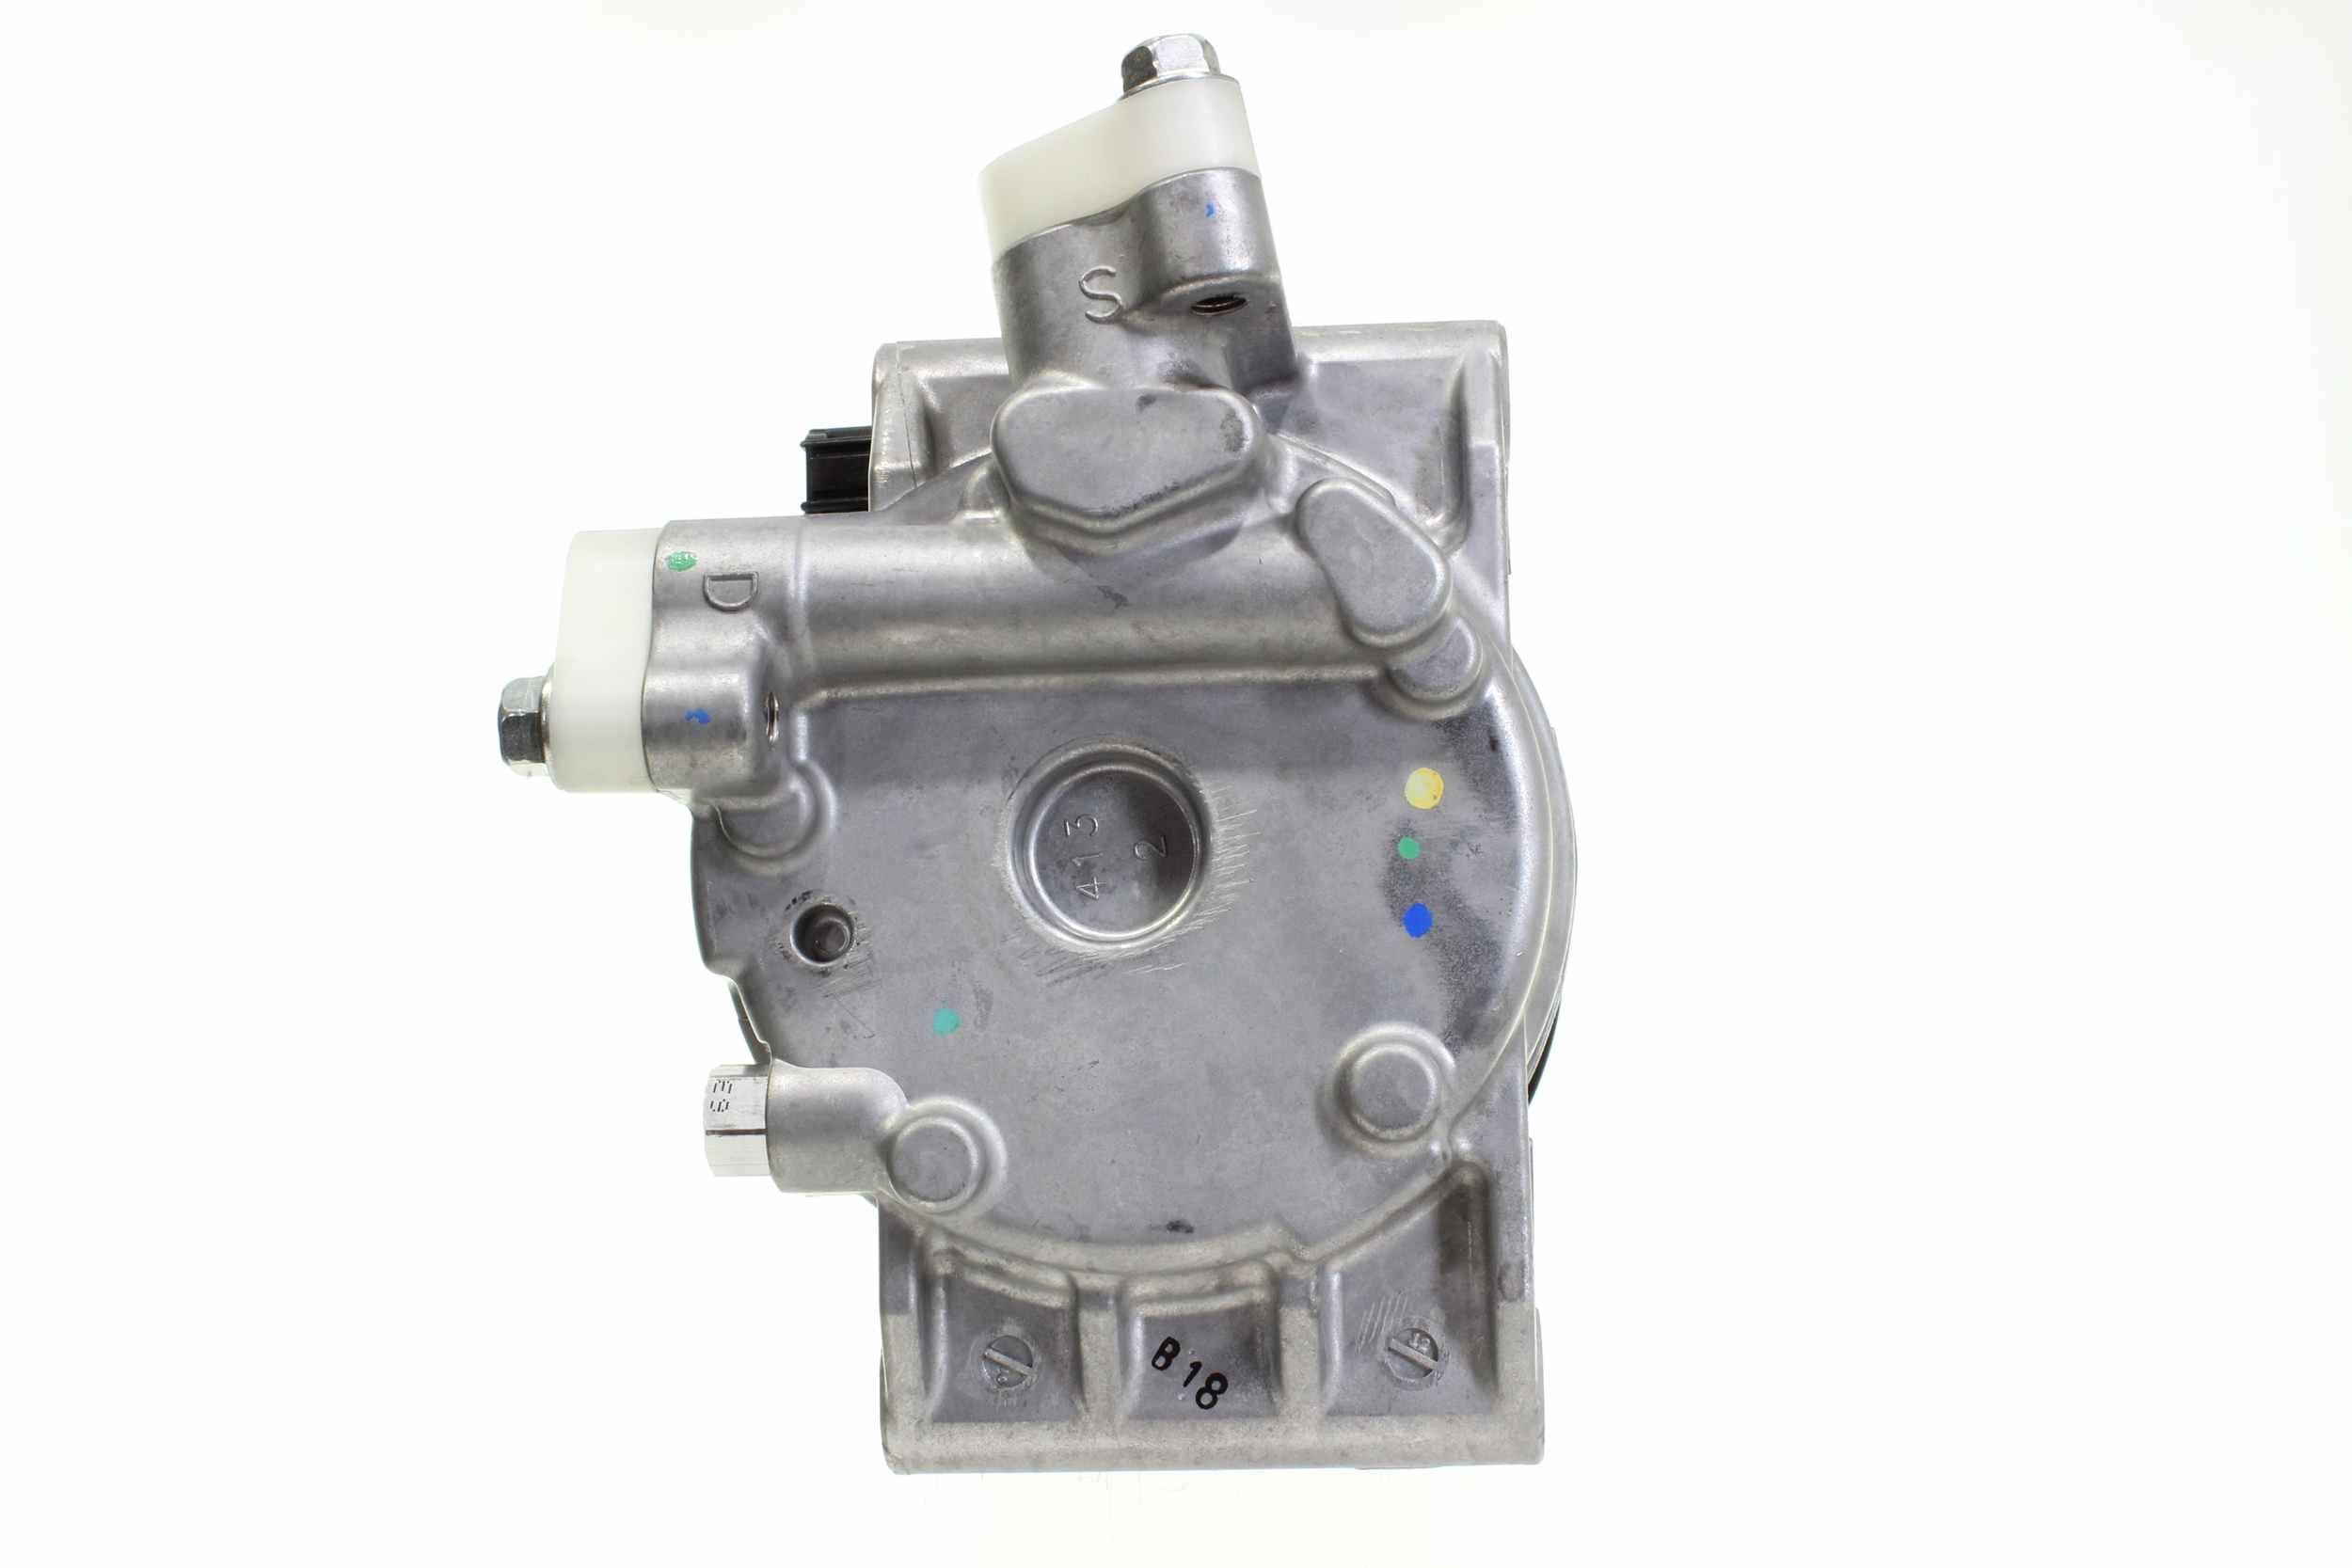 10550920 Kompressor, Klimaanlage ALANKO 550920 - Große Auswahl - stark reduziert